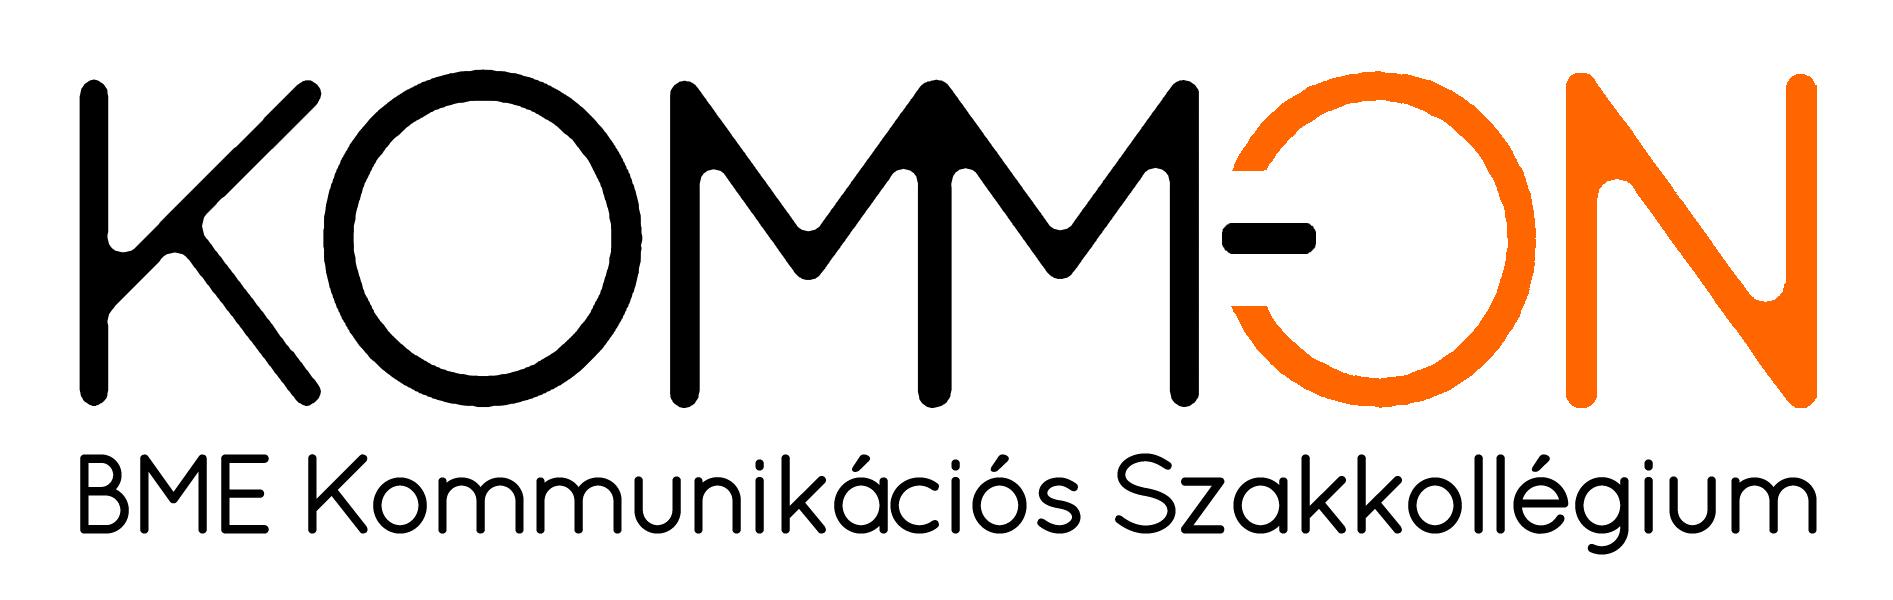 logo_narancs_f.jpg